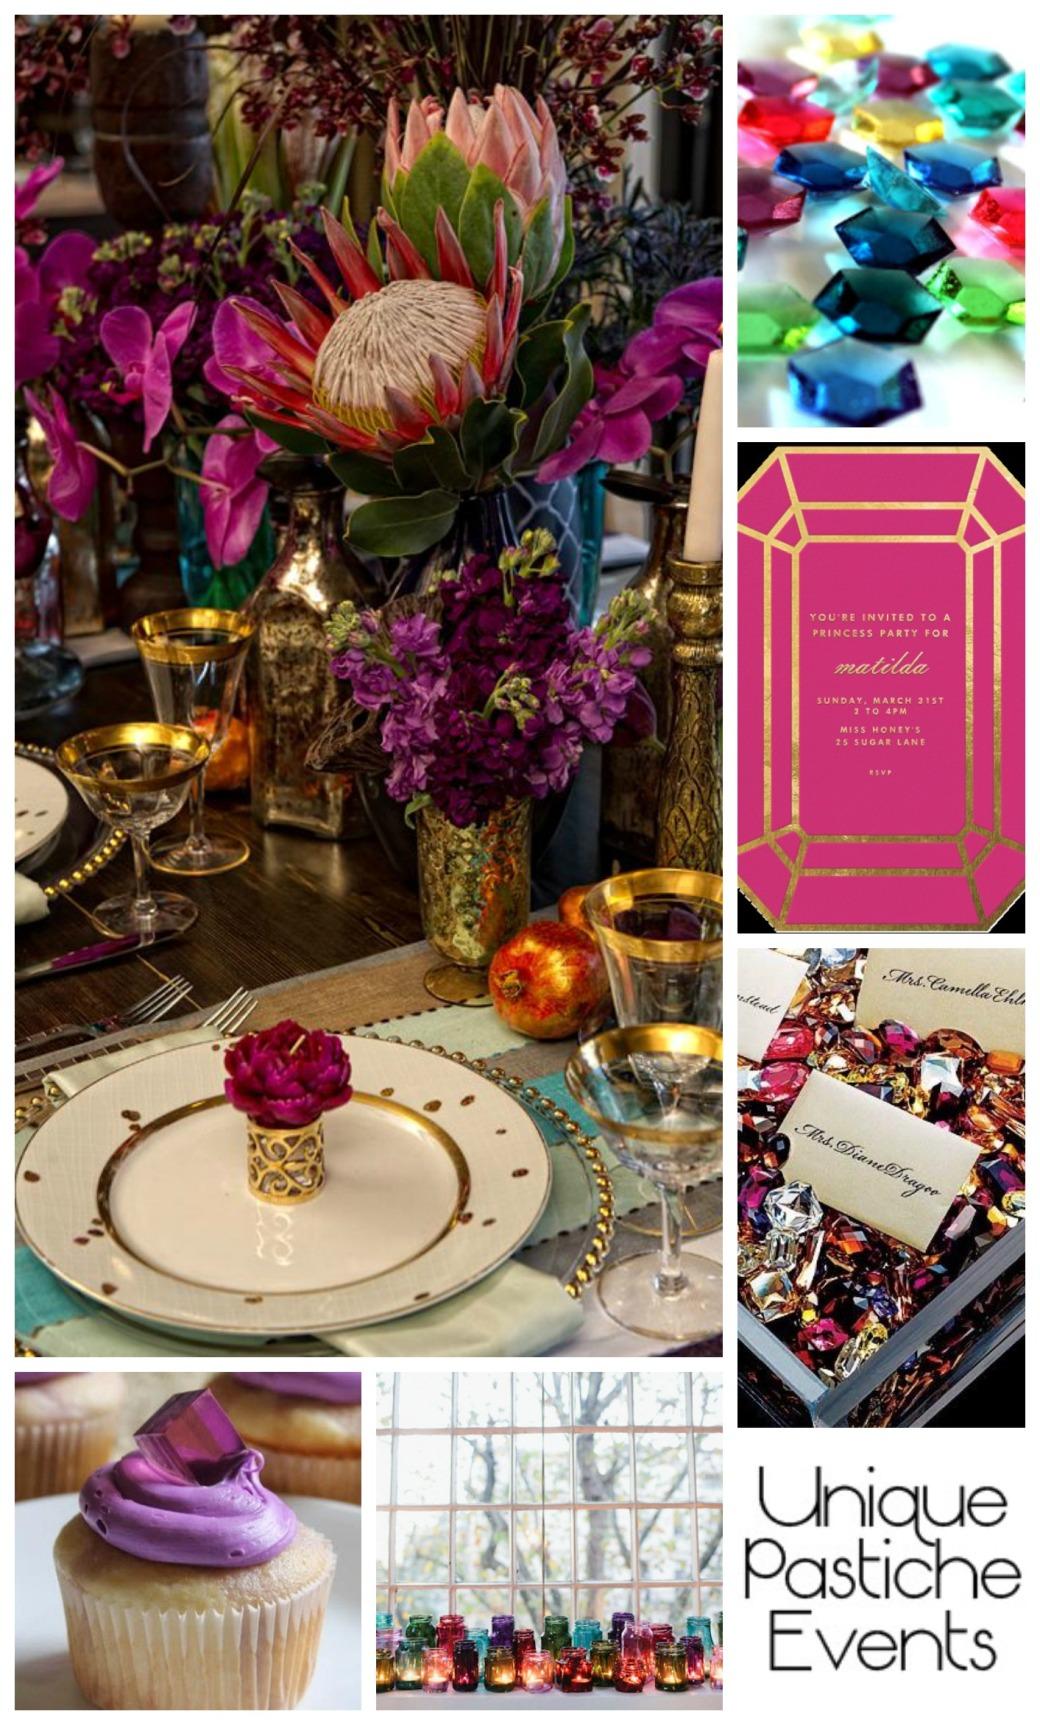 Luxurious Gem Themed Party + Celebration Ideas Enjoy the full post here: https://uniquepasticheevents.com/2015/06/03/luxurious-gem-themed-party-celebration-ideas/